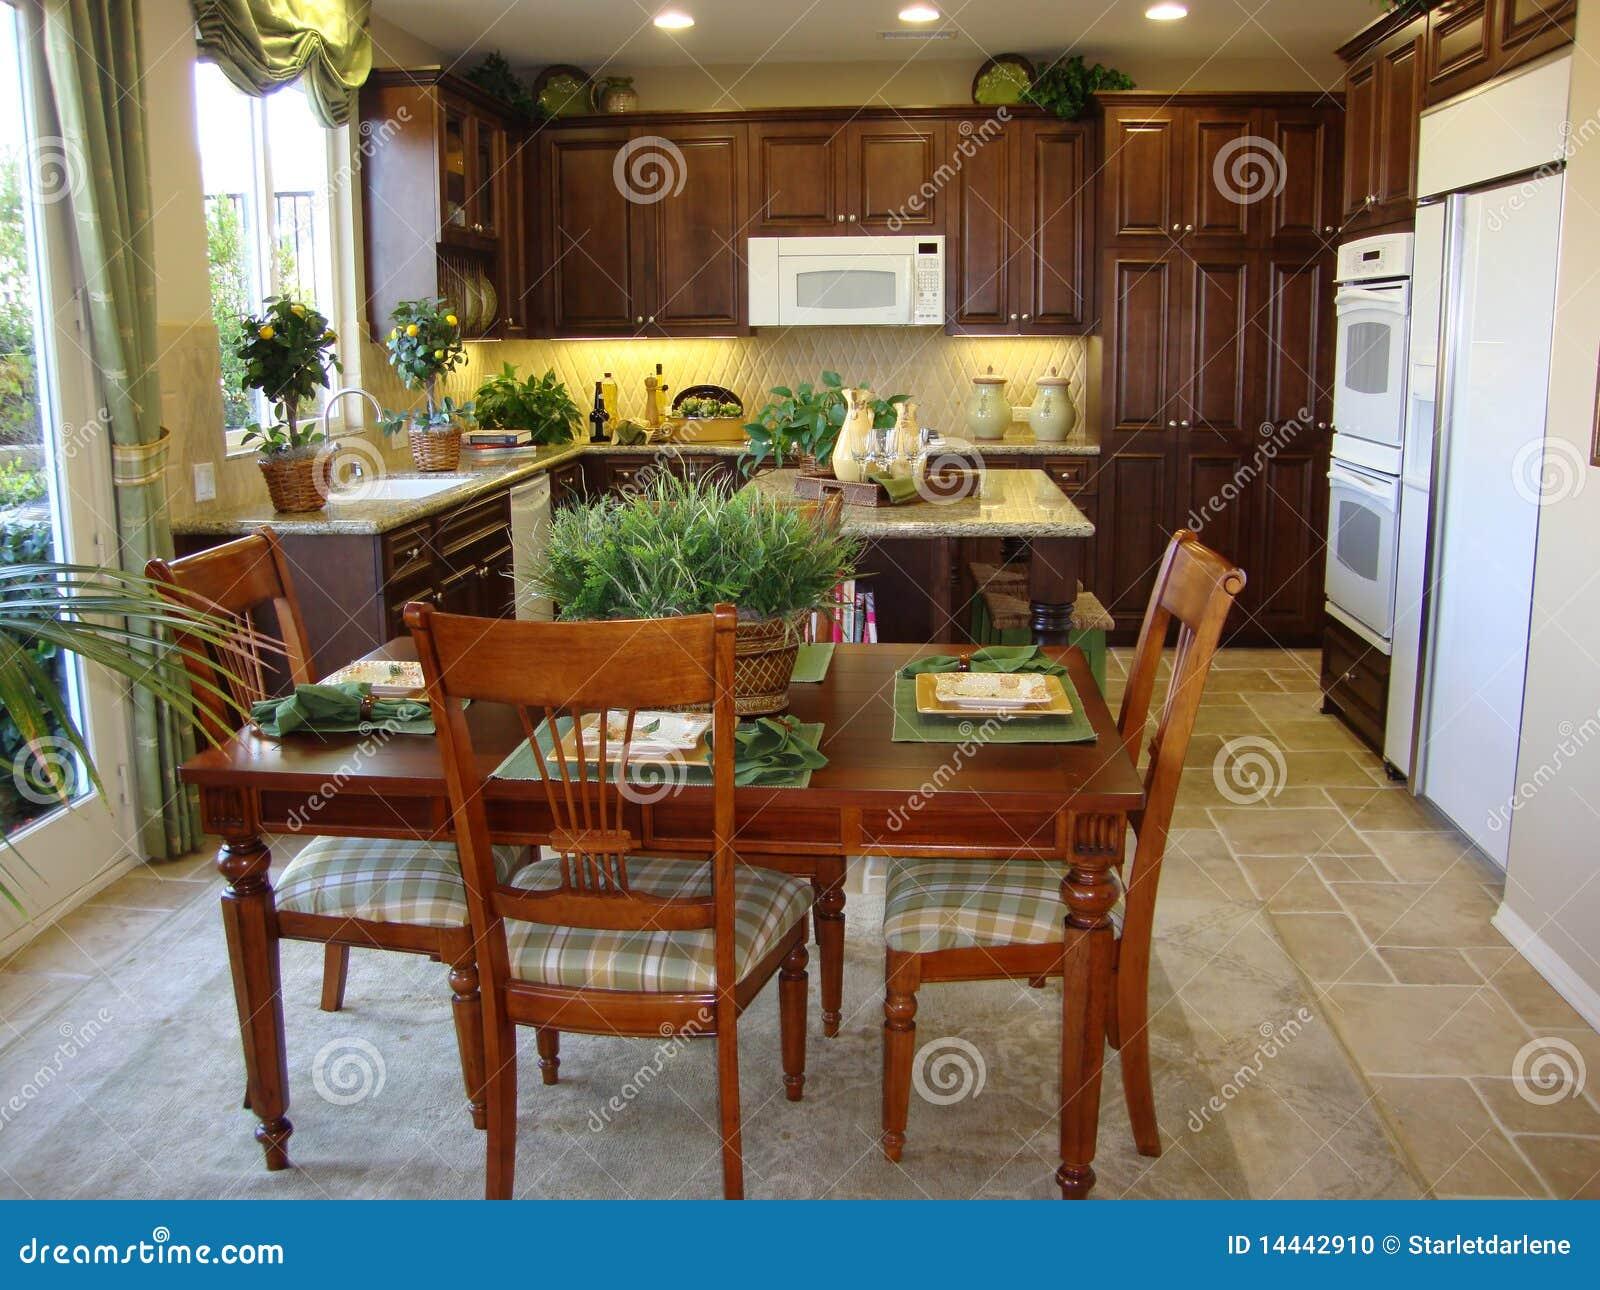 Cucina E Sala Da Pranzo Belle Fotografia Stock - Immagine ...